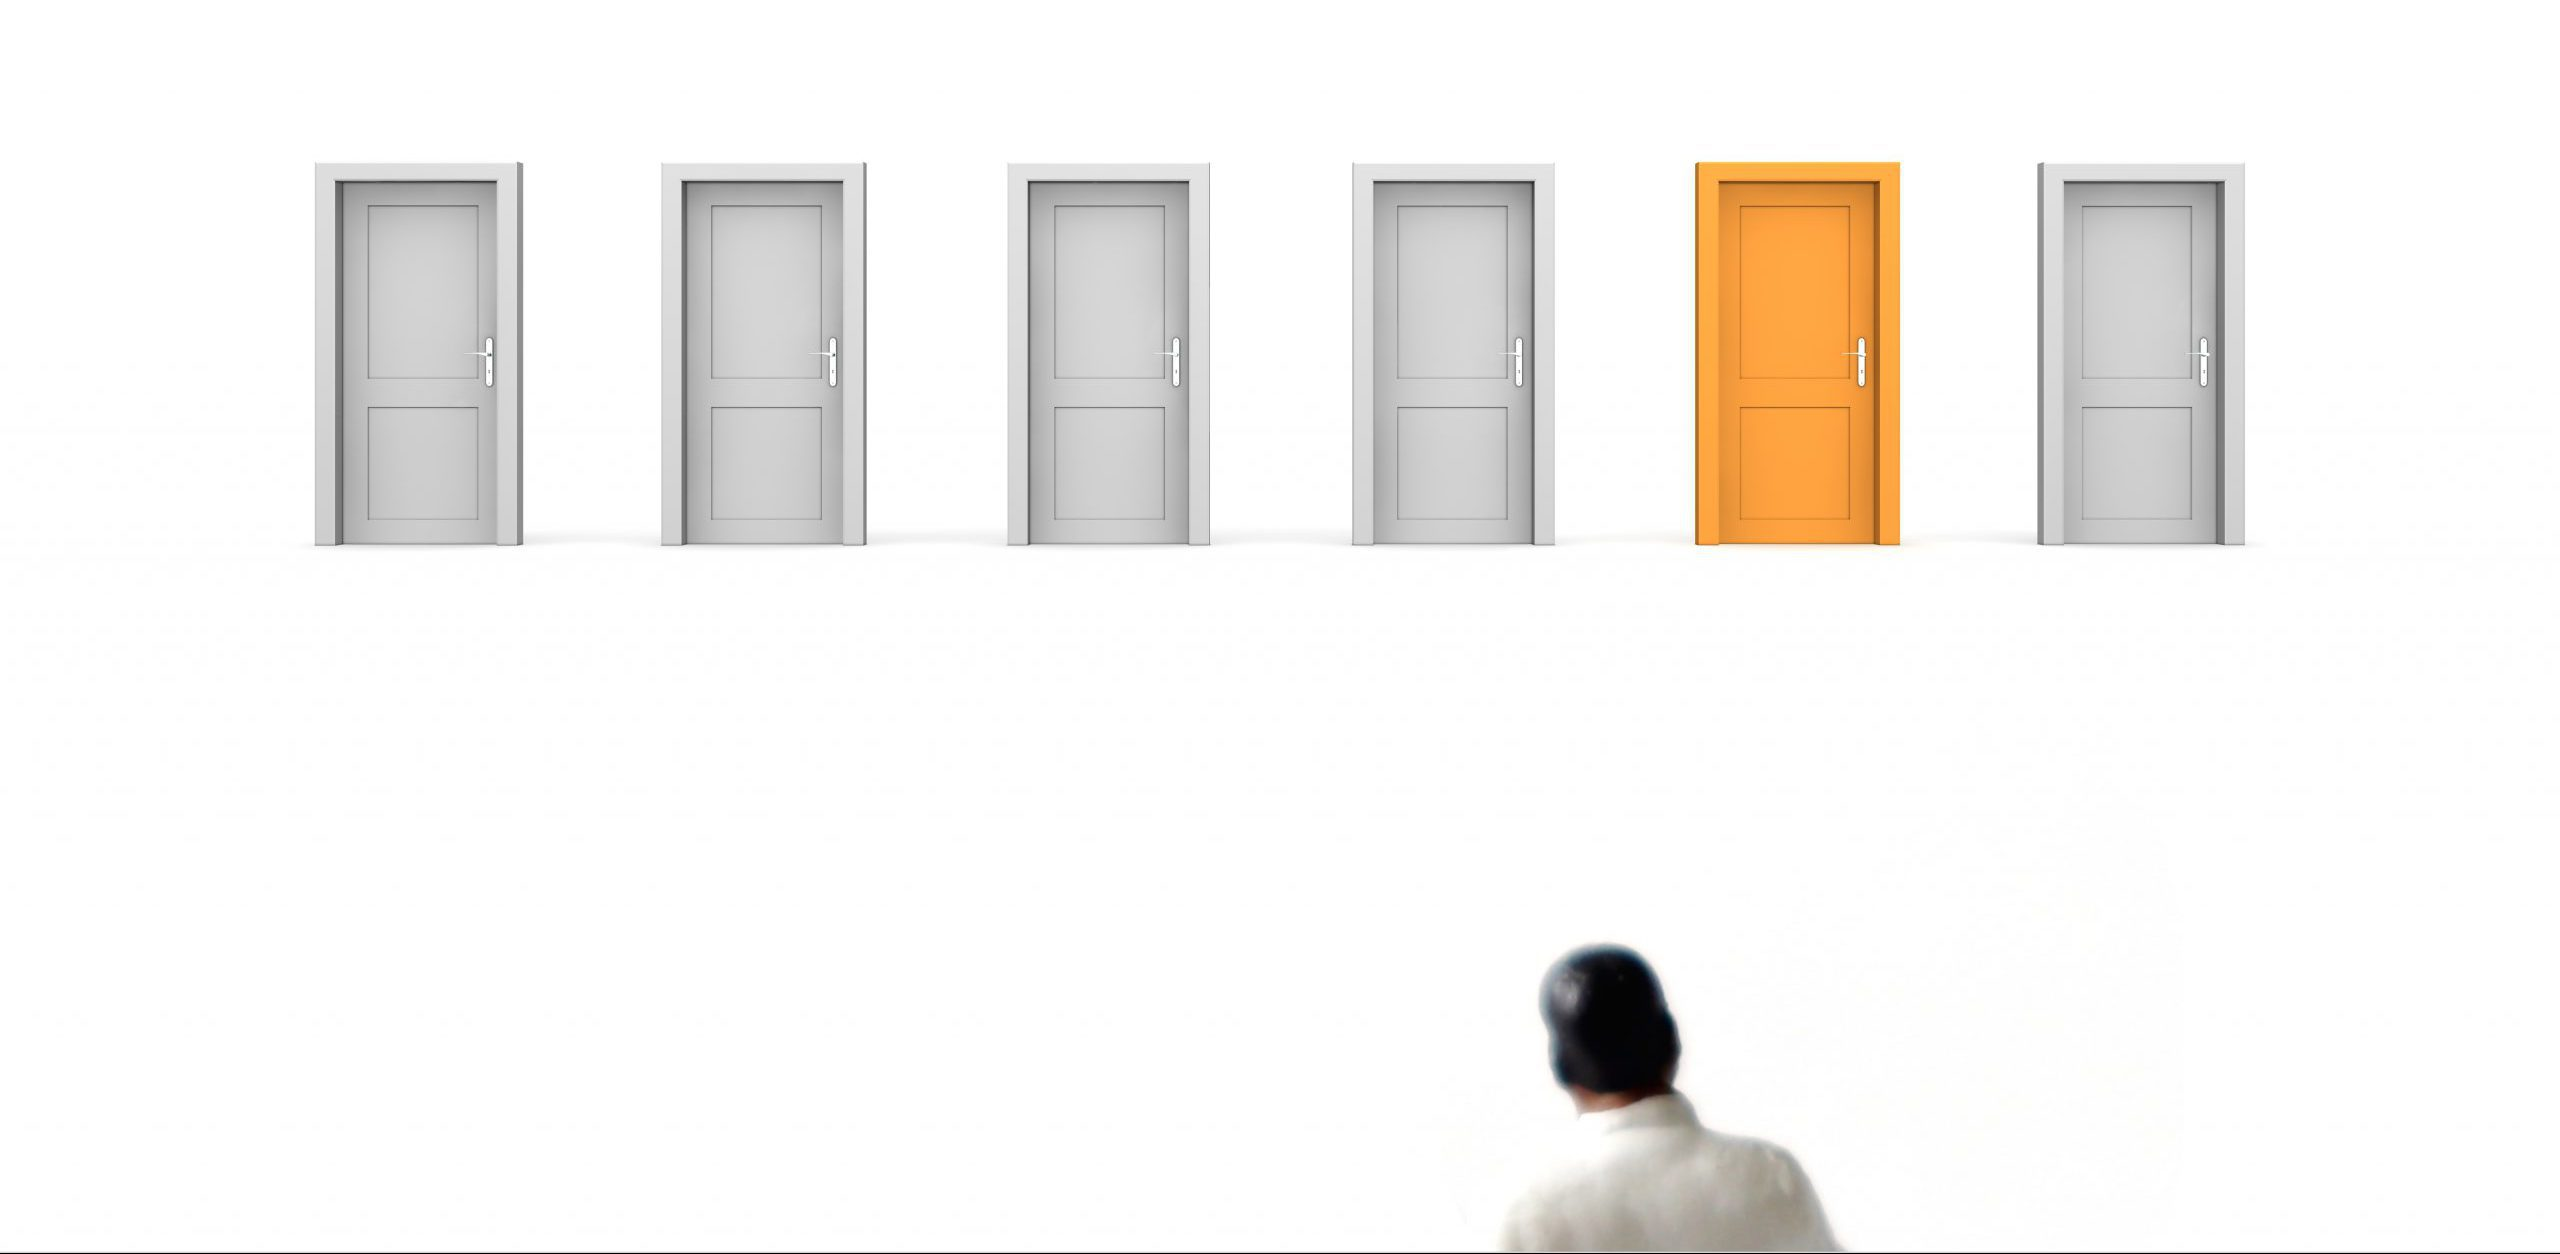 Man standing in front of closed doors